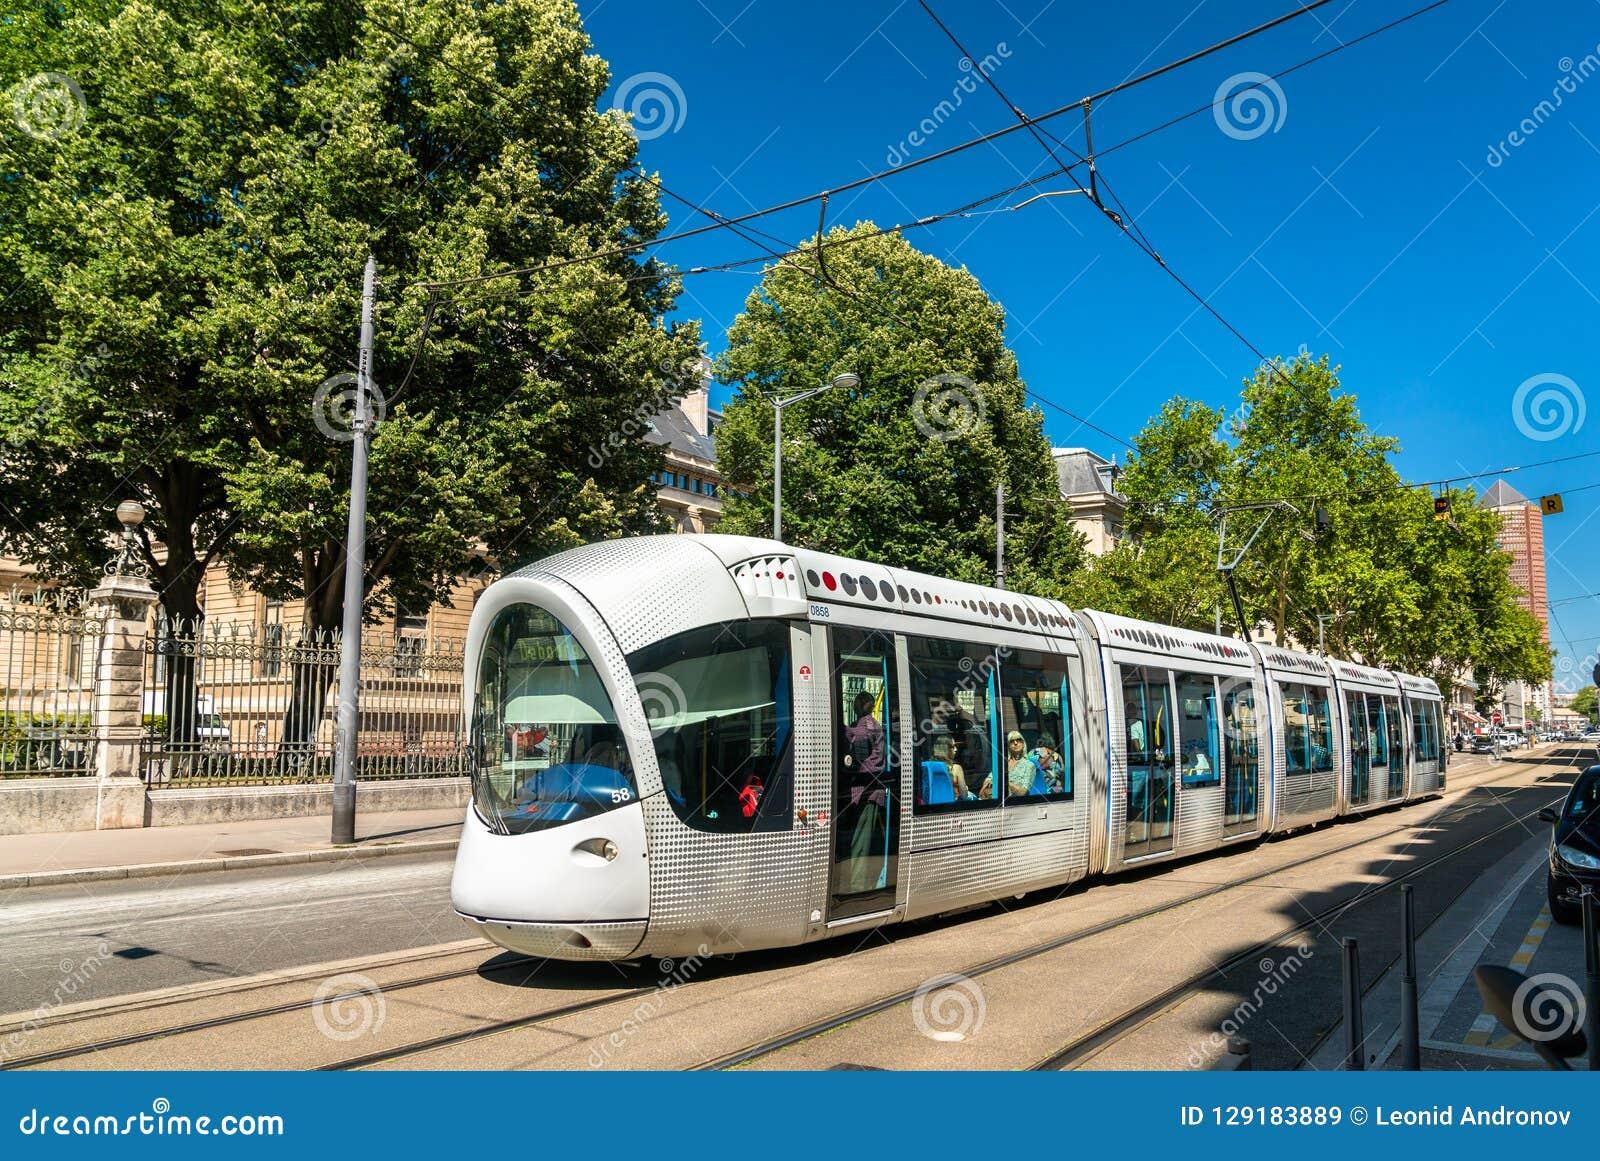 Alstom Citadis 302 tramwaj w Lion, Francja